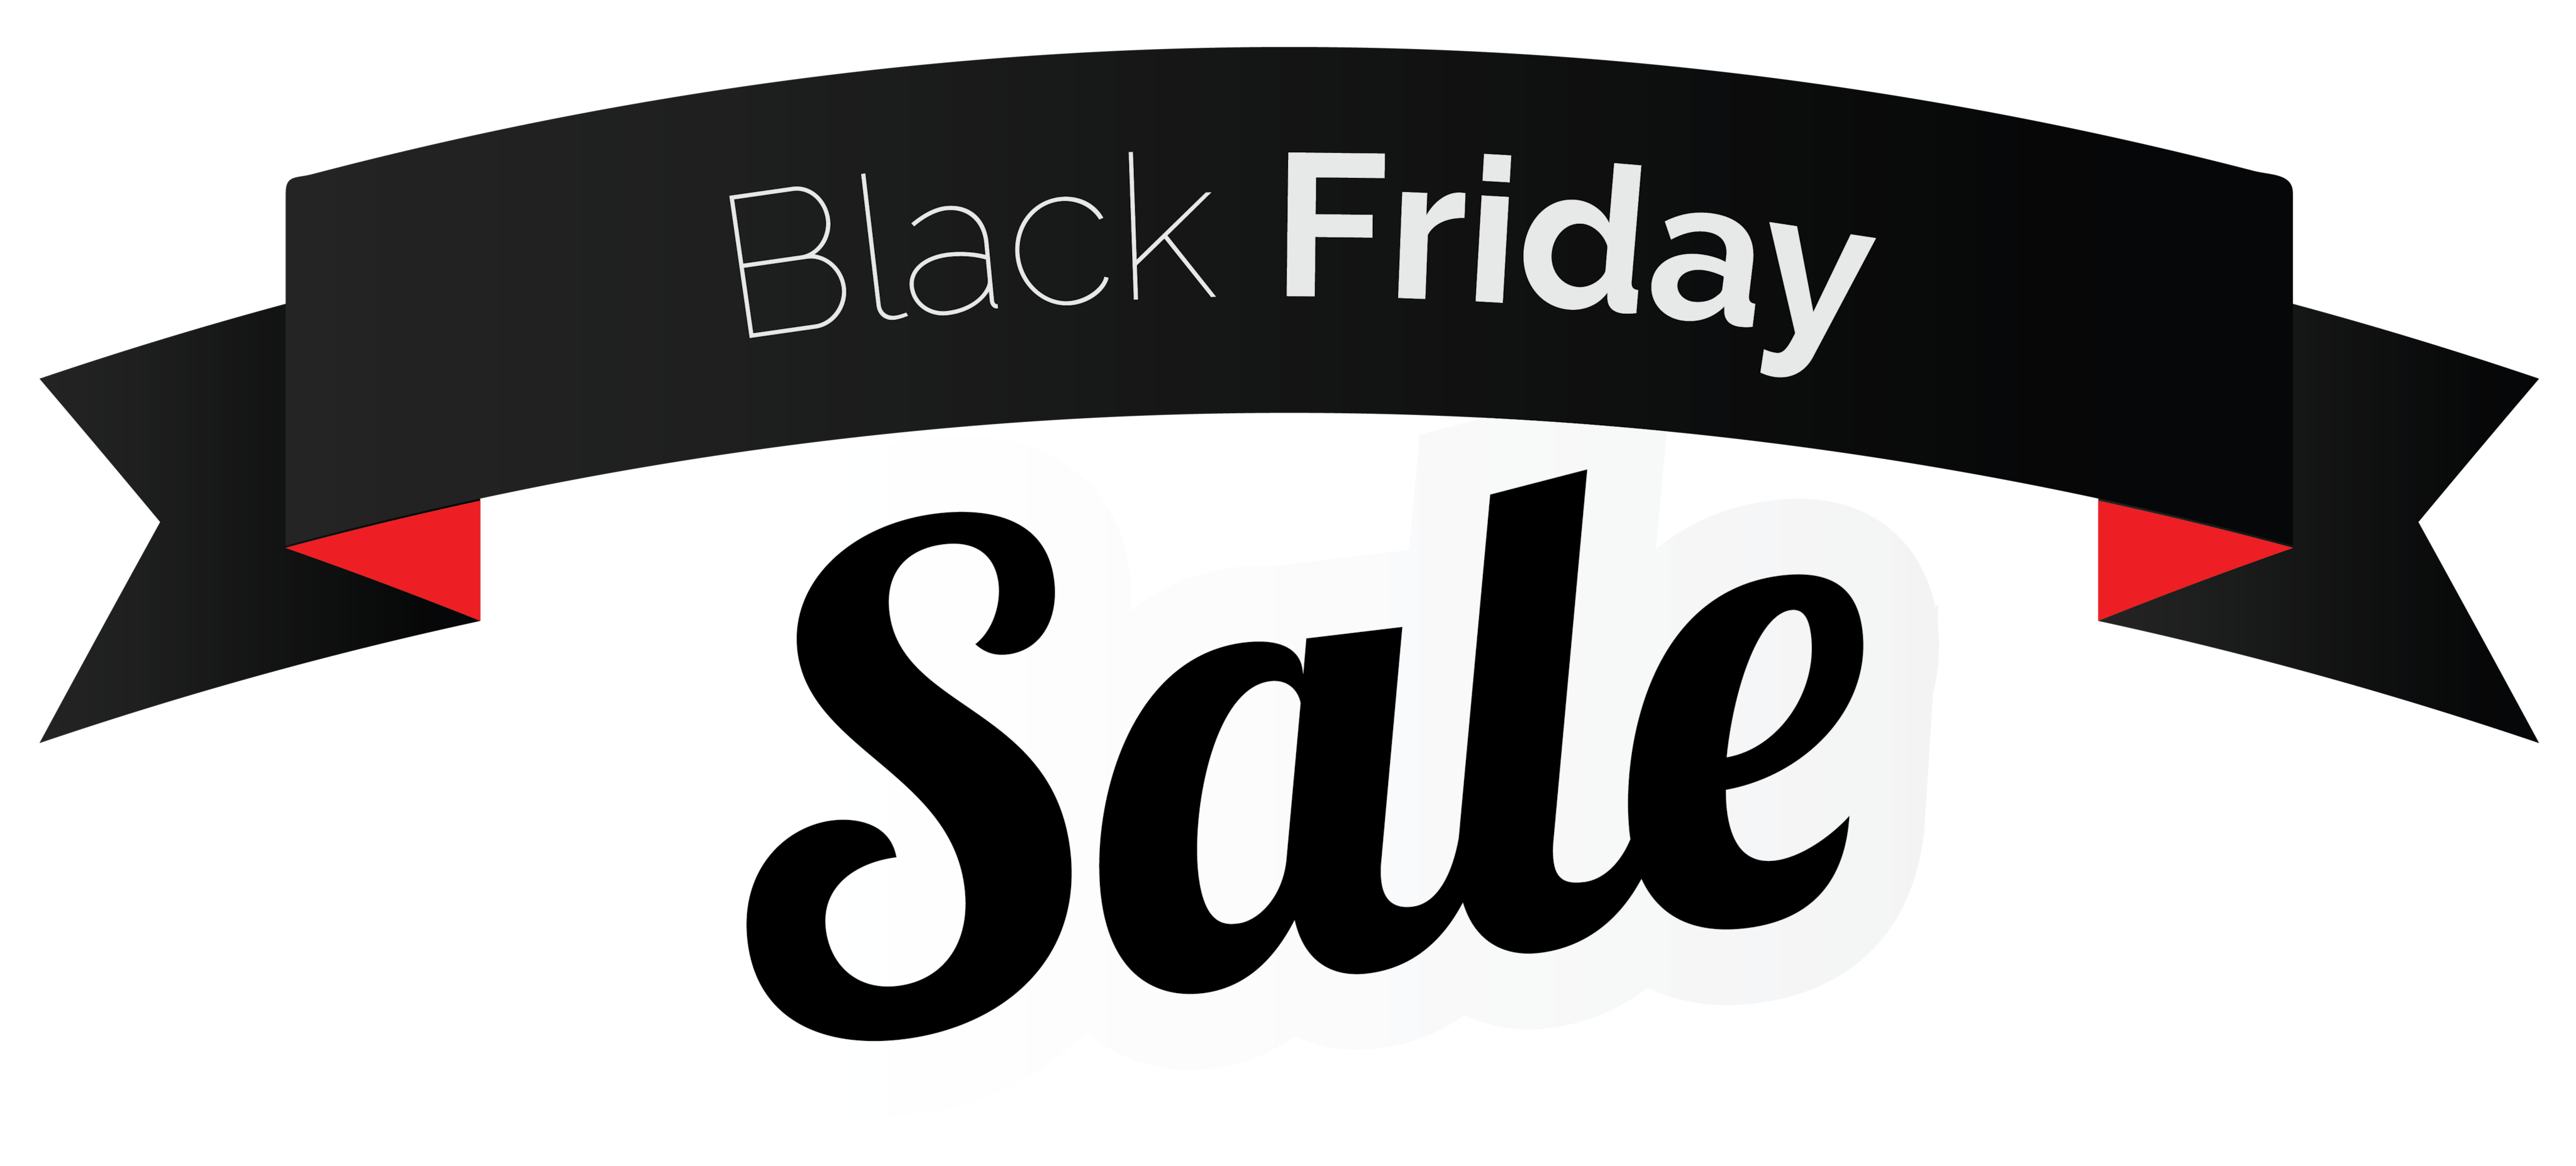 Black Friday Sales >> Black Friday Sales Event West Herr Honda